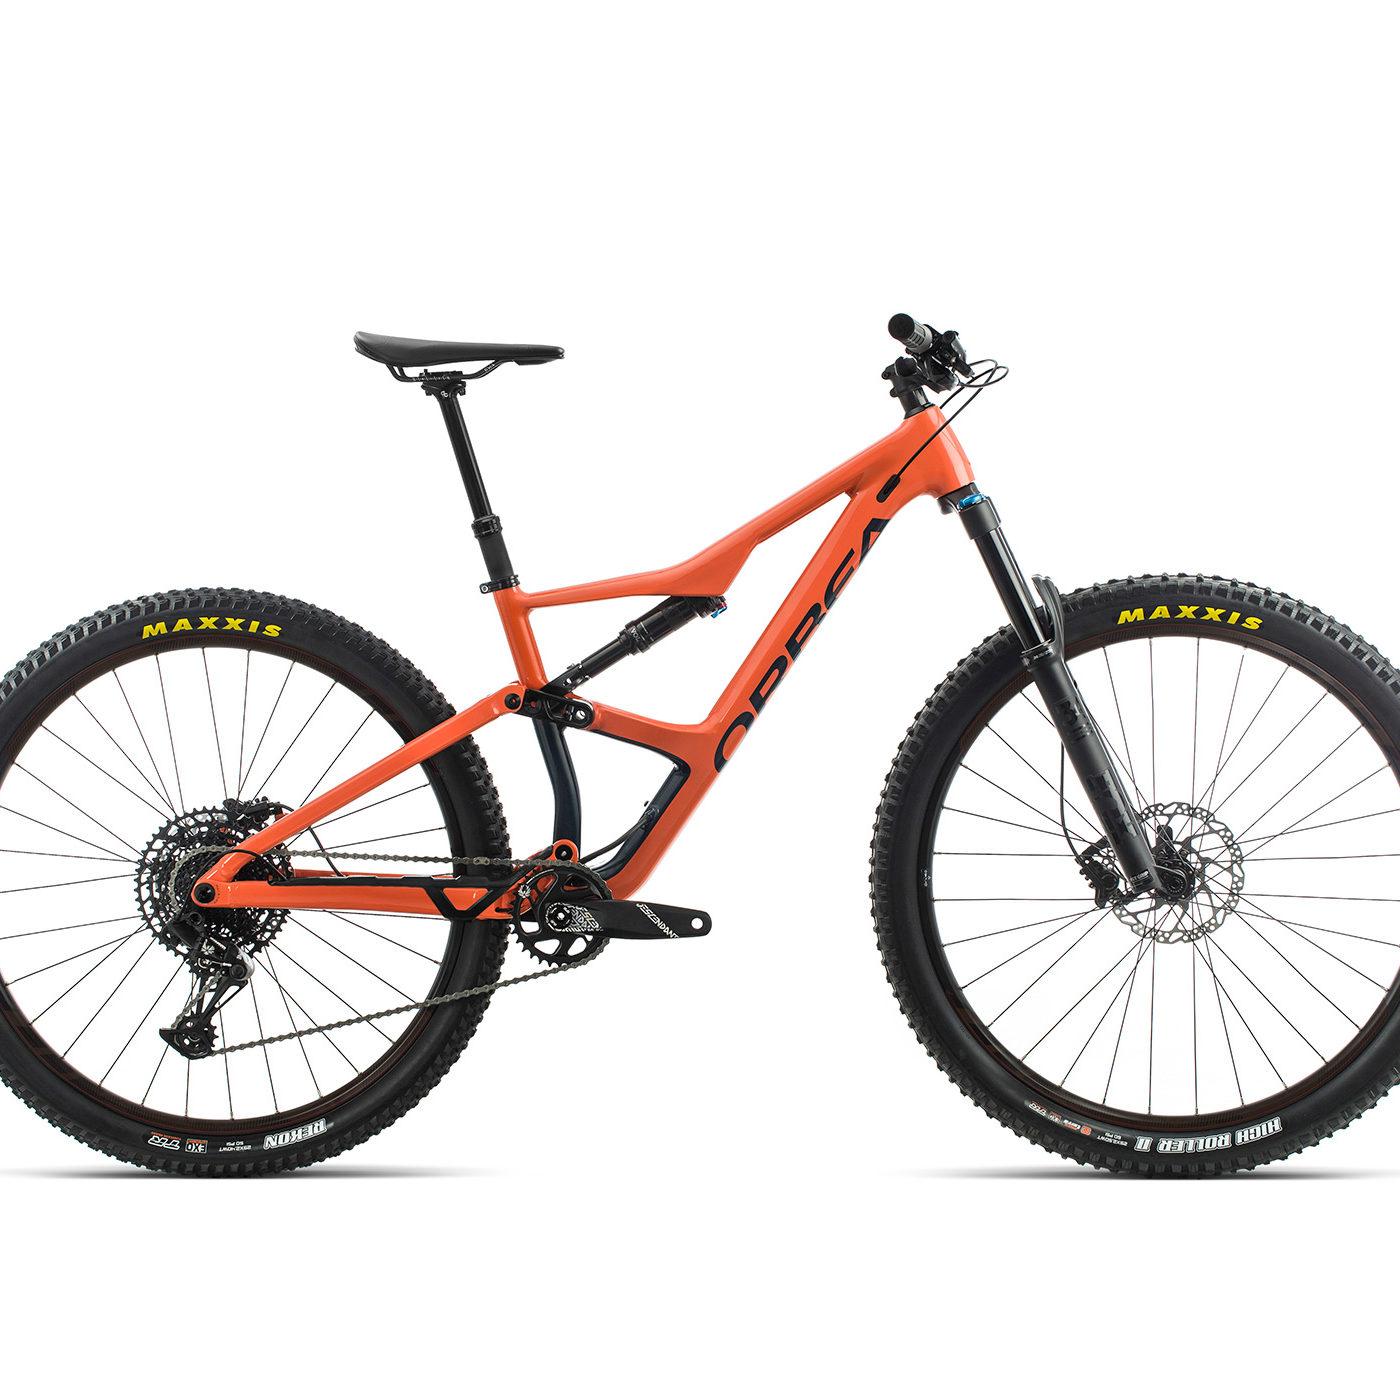 ORBEA Occam H20-EAGLE - ZALM / BLAUW INDIGO (GLOSS) @G-Bikes